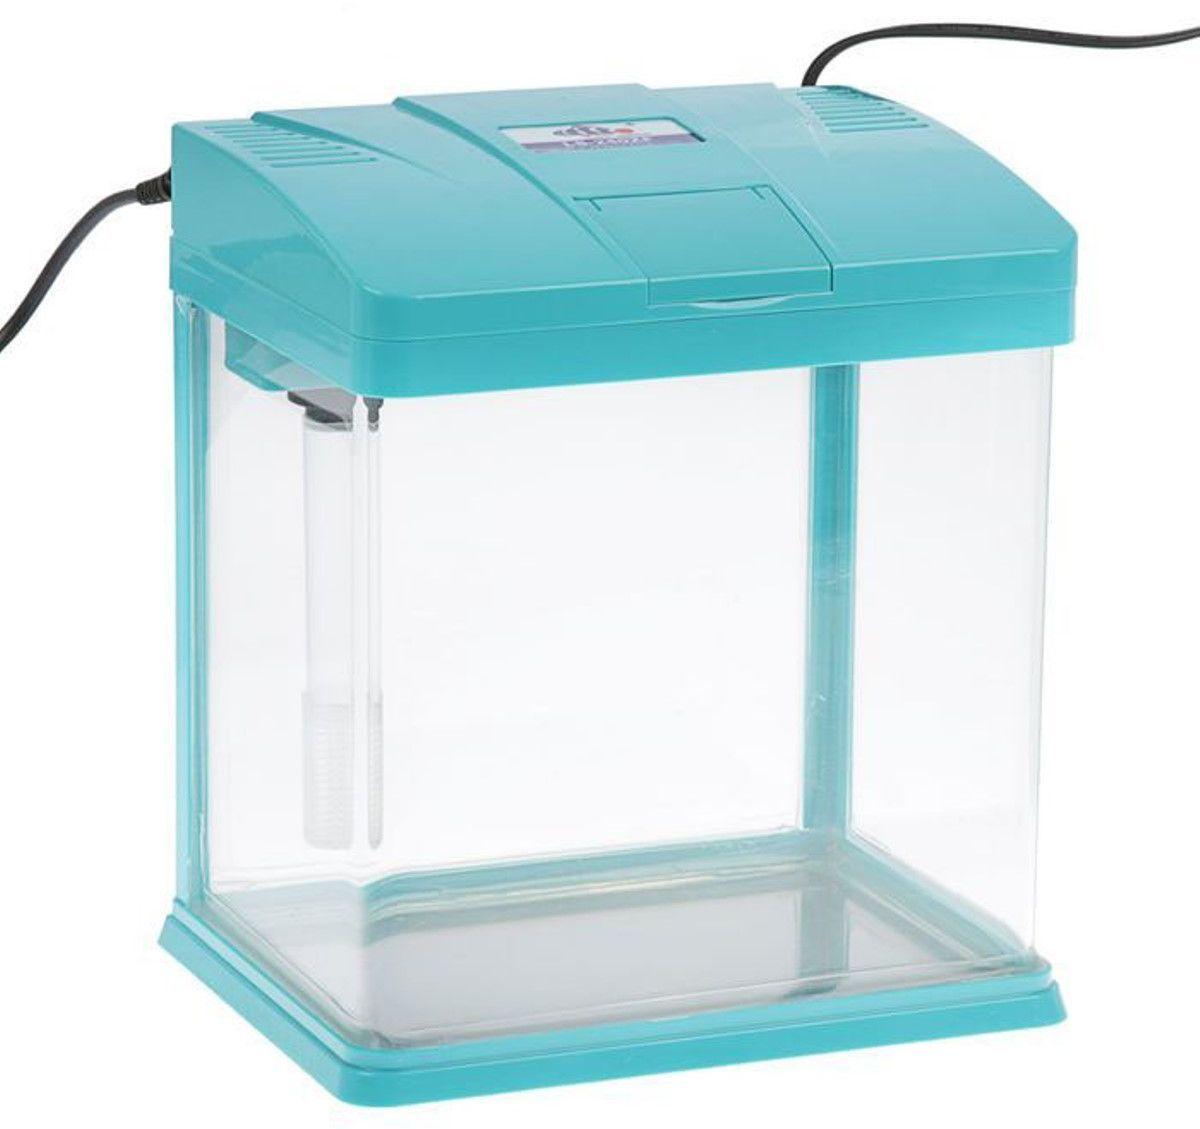 Аквариум Sea Star  LS-240 , цвет: голубой, прозрачный, 12 л - Аквариумы и террариумы